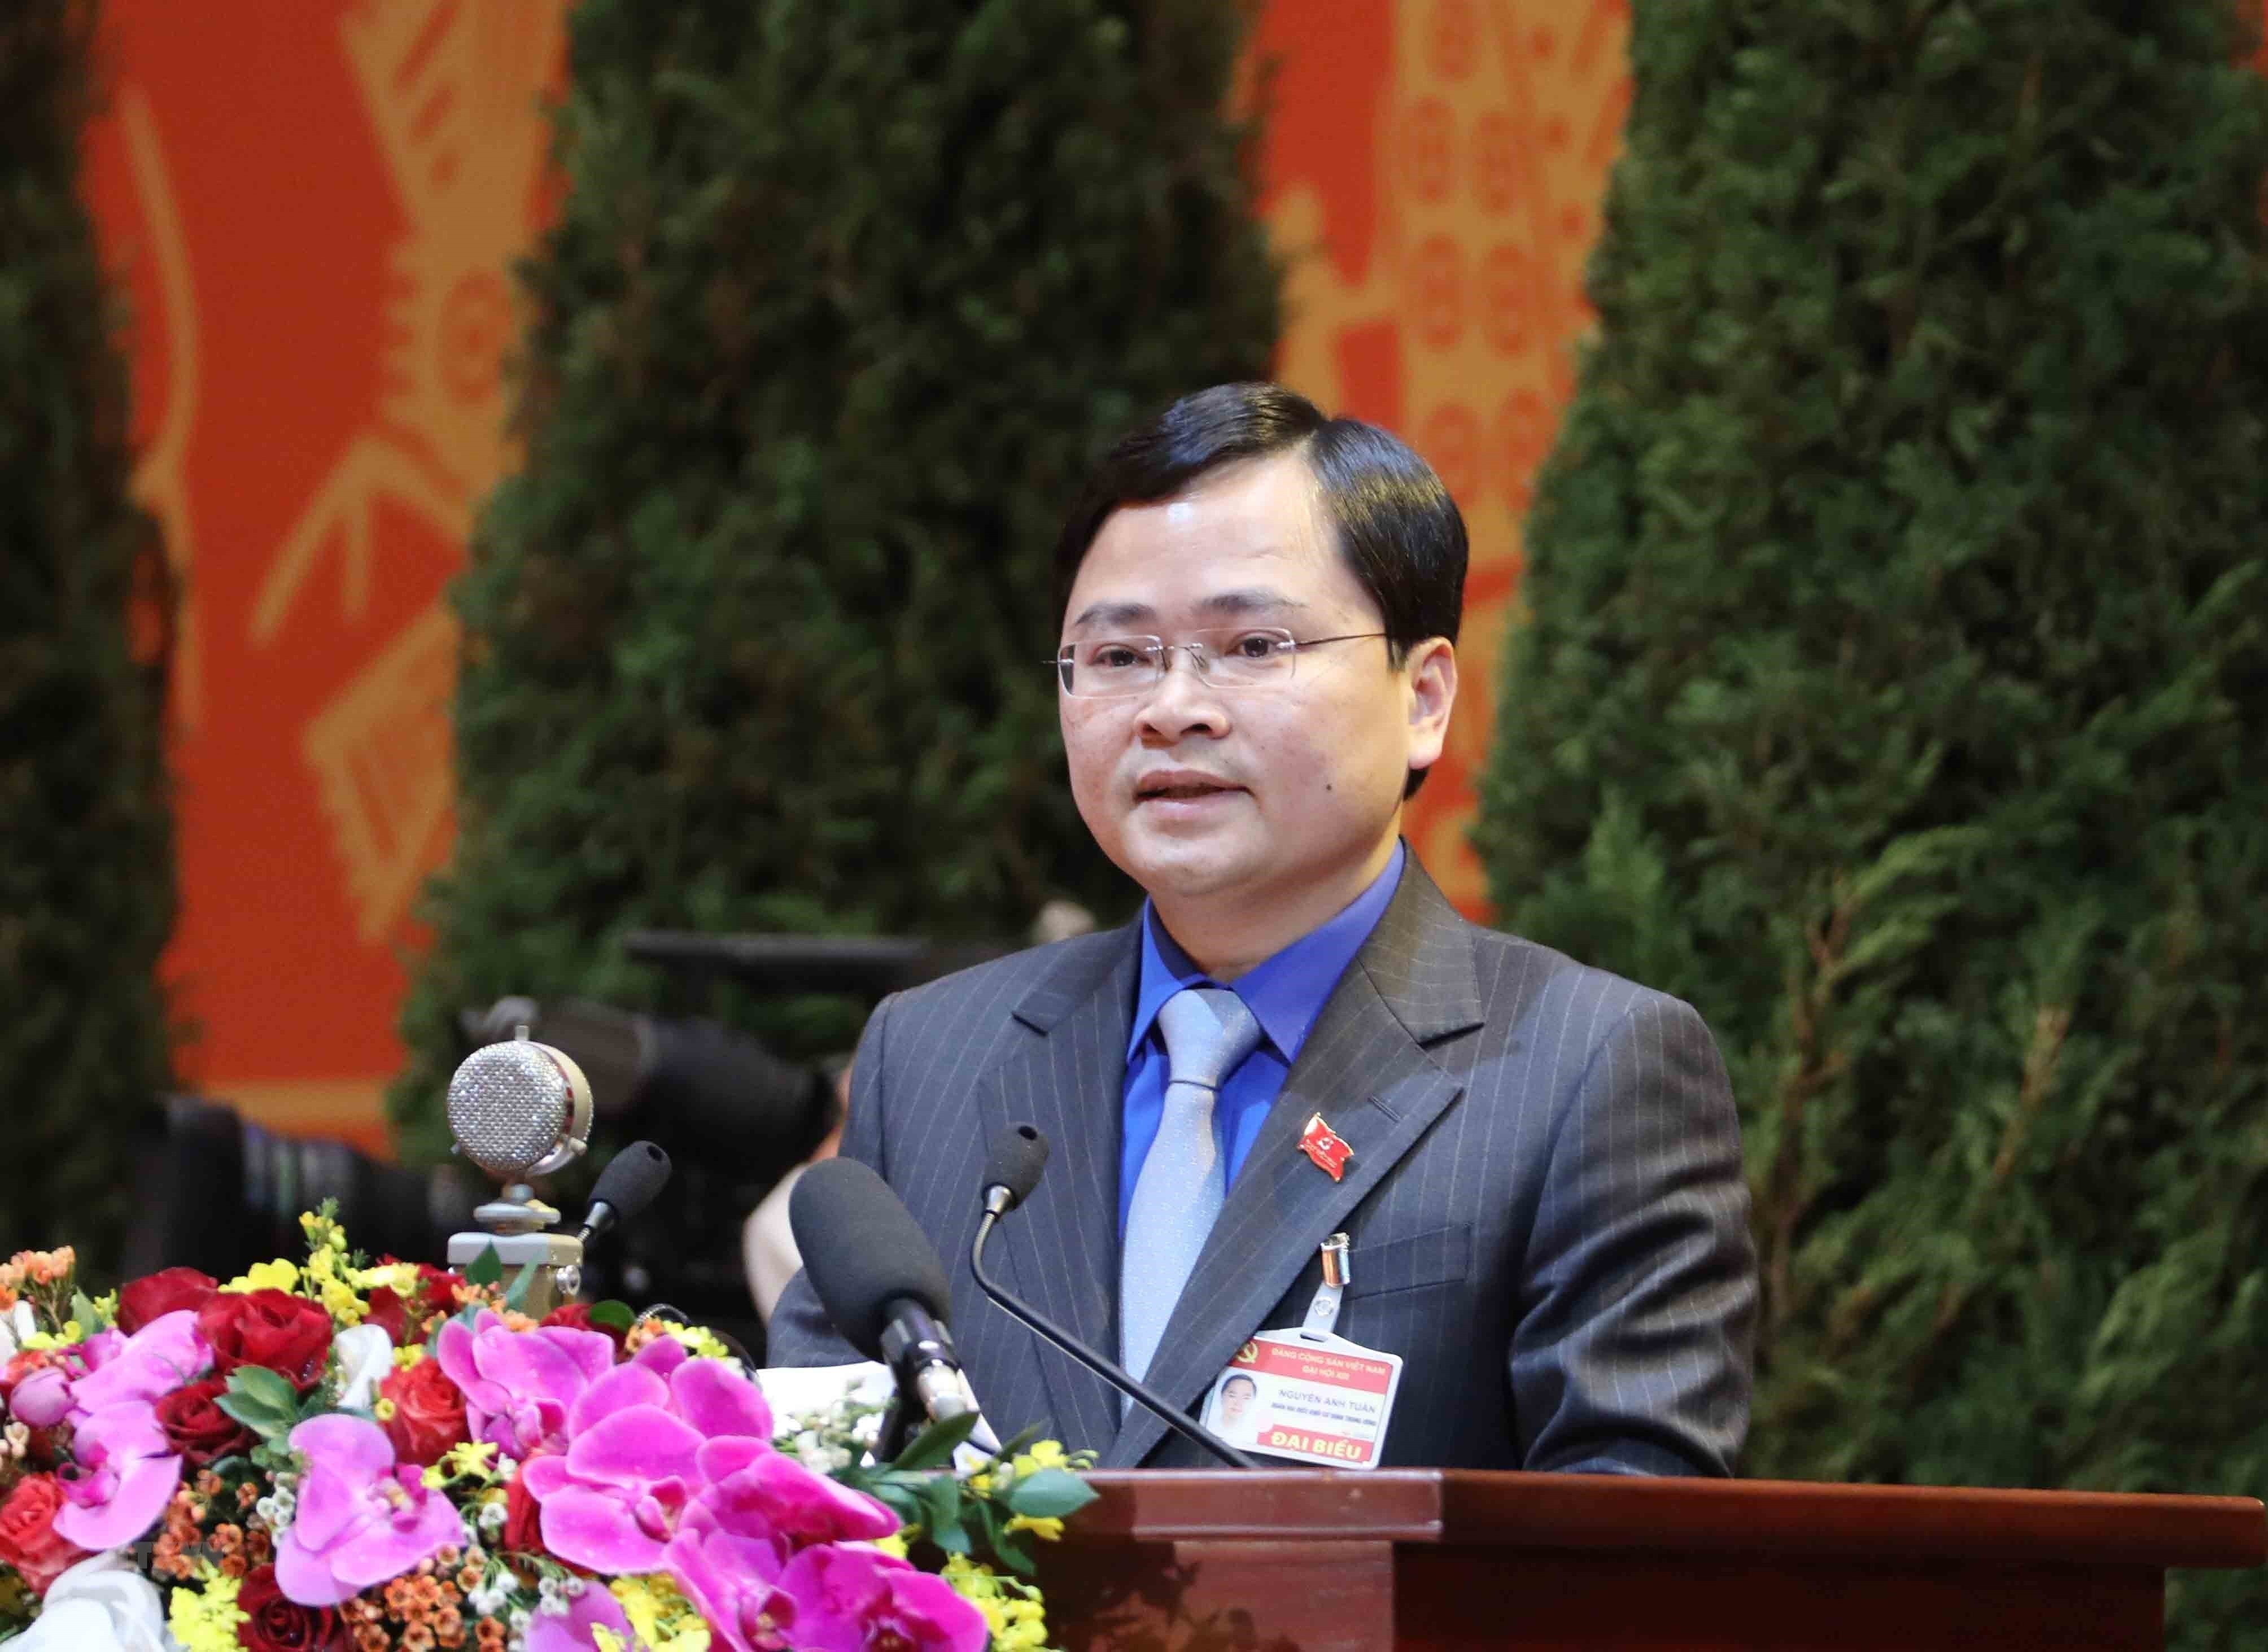 [Photo] Quang canh phien thao luan cac van kien Dai hoi XIII cua Dang hinh anh 3